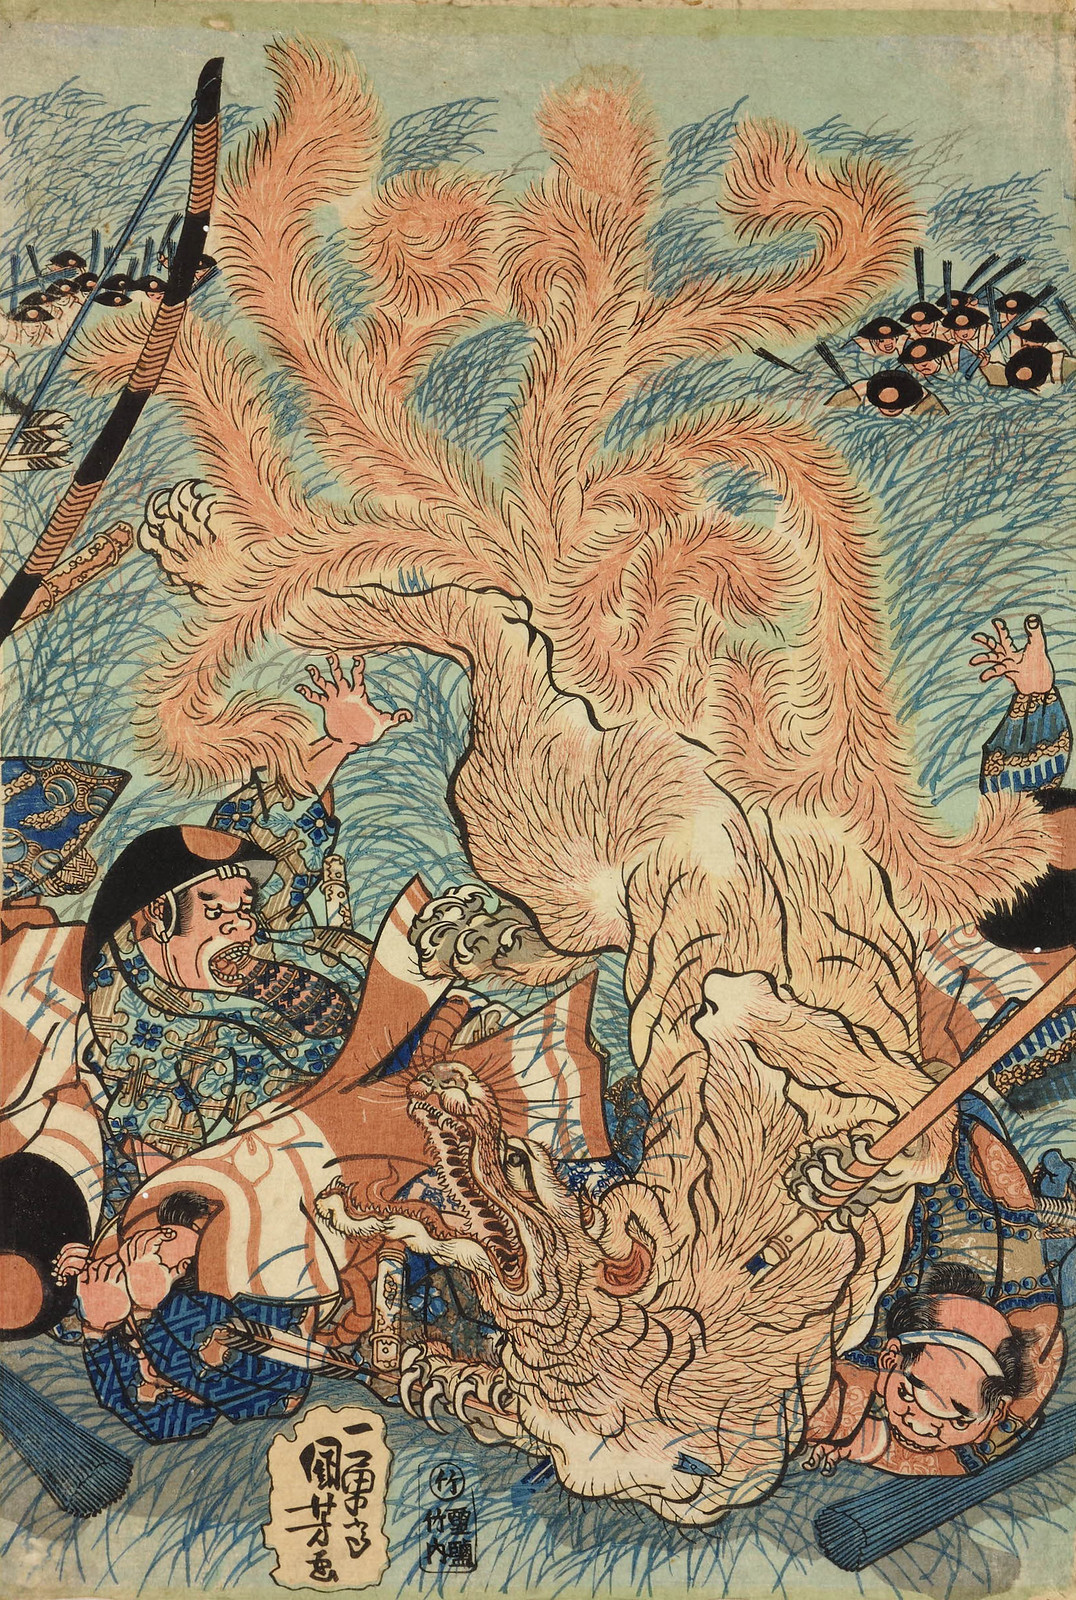 Utagawa Kuniyoshi - The Nine-tailed Fox slain on Nasu moor, Shimotsuke, 1834 (middle panel)